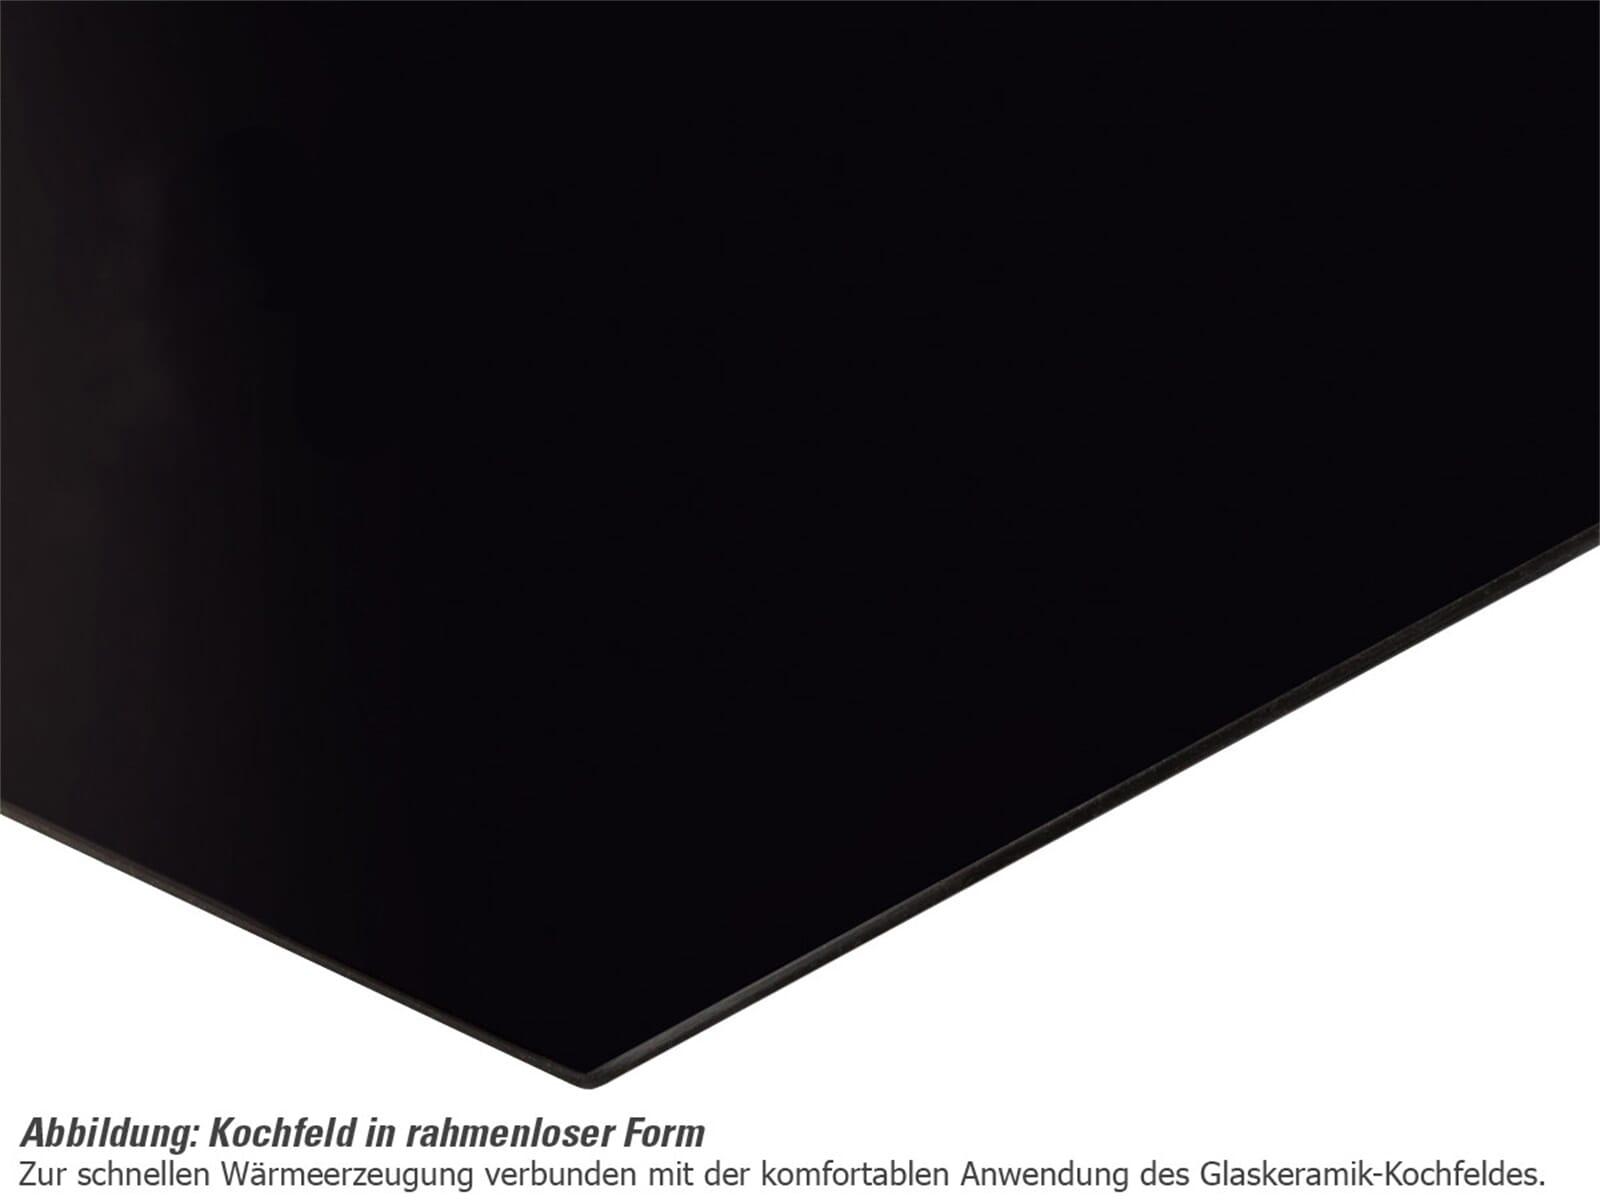 Oranier FLI 2038 GRILL - 2038 11 Domino Induktionskochfeld autark